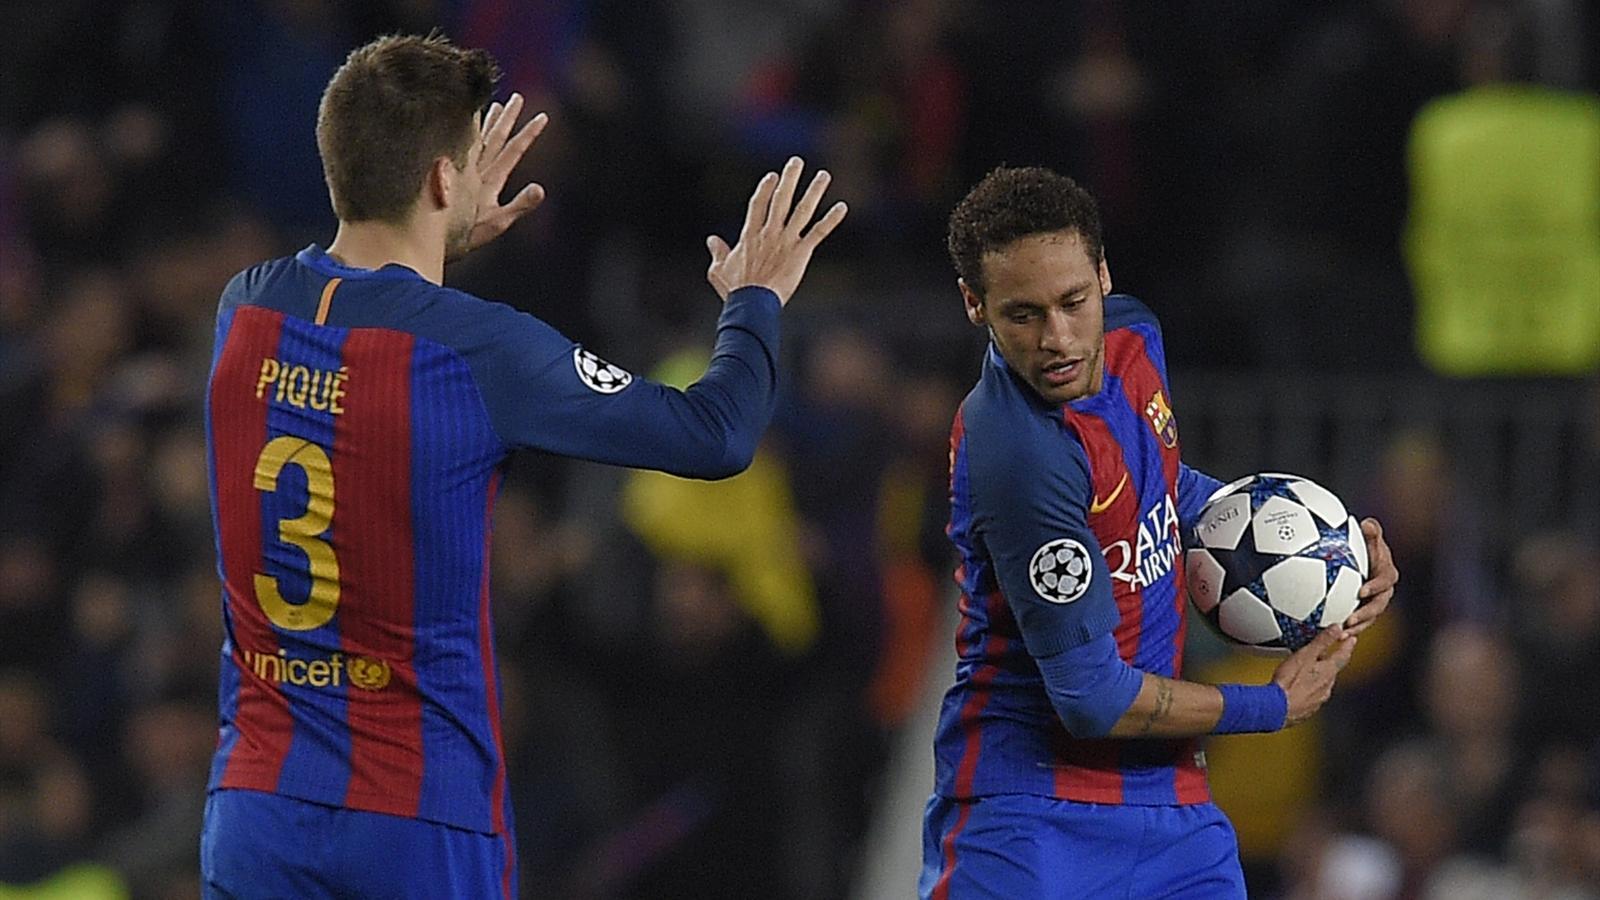 Gerard Pique on Neymar tweet - I knew he was going